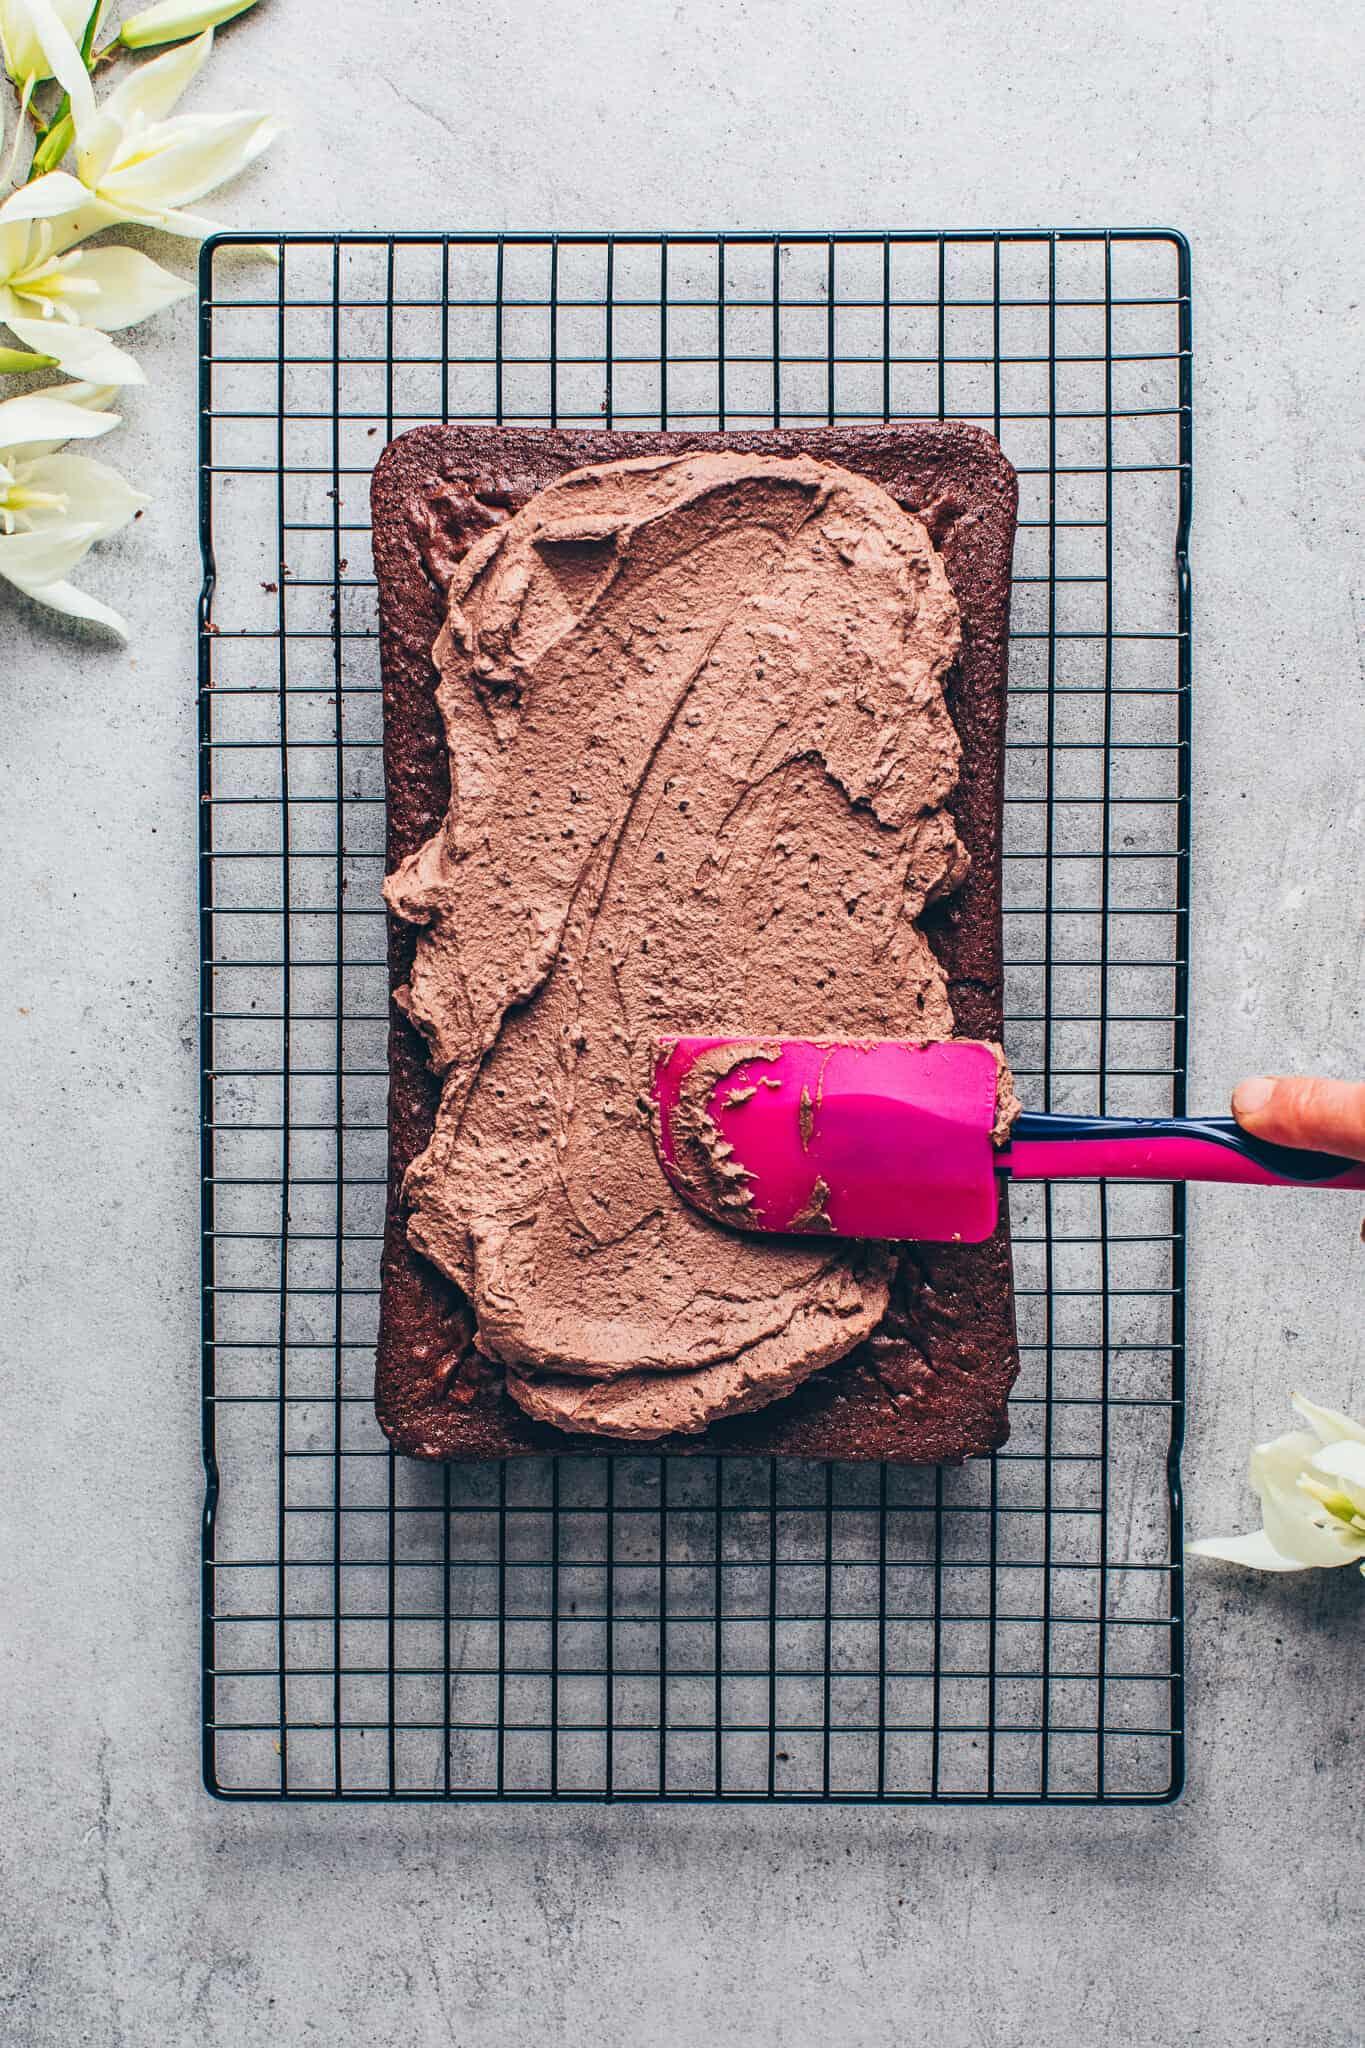 Chocolate cake with chocolate frosting. Vegan sheet cake brownies